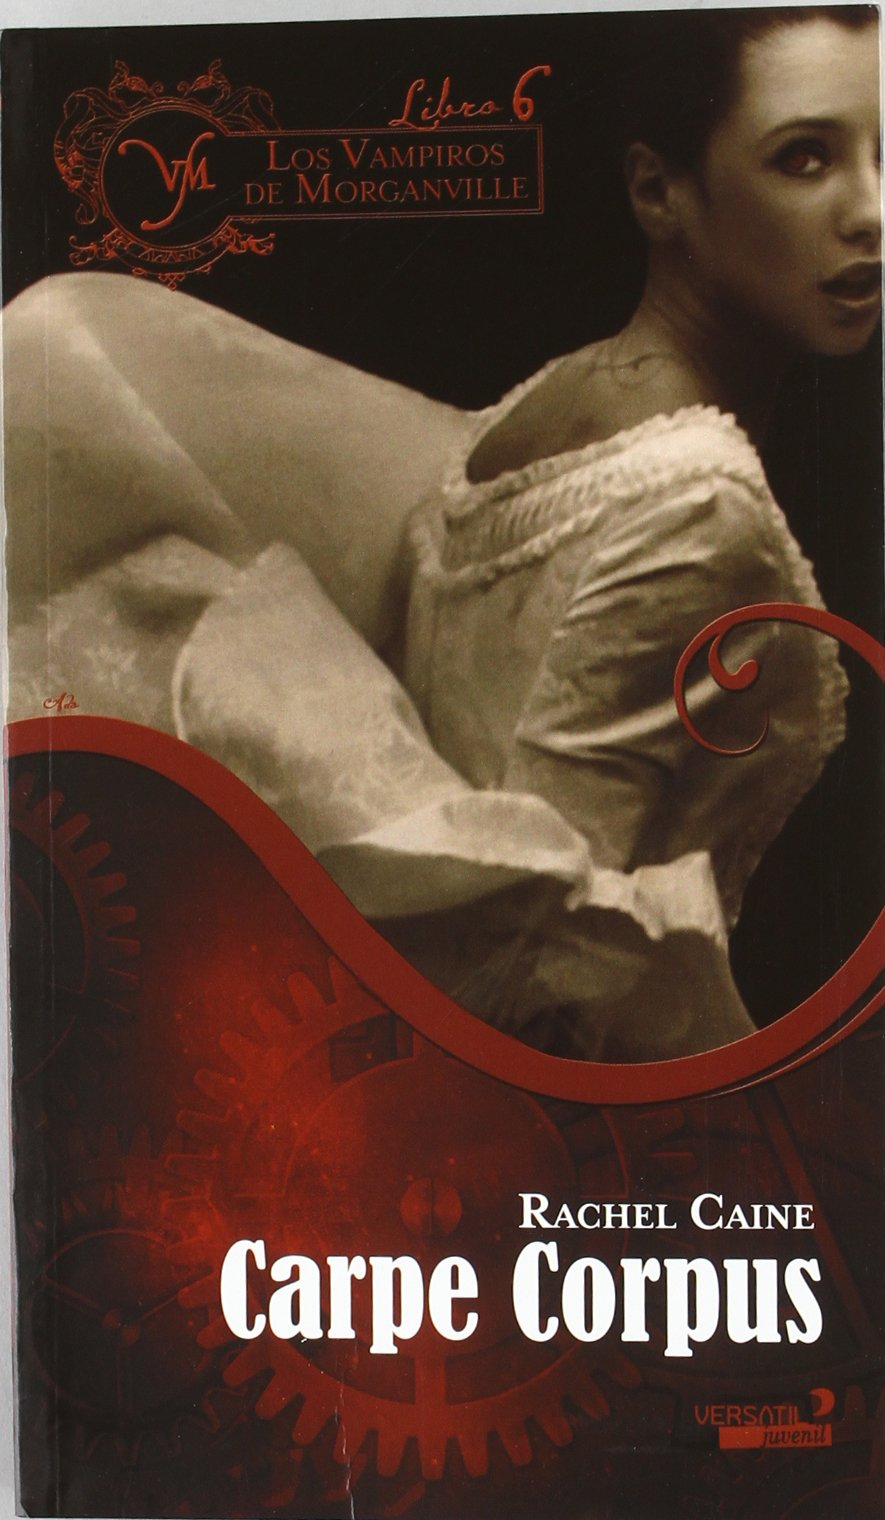 Los Vampiros de Morganville VI. Carpe Corpus: Rachel Caine: 9788492929559: Amazon.com: Books